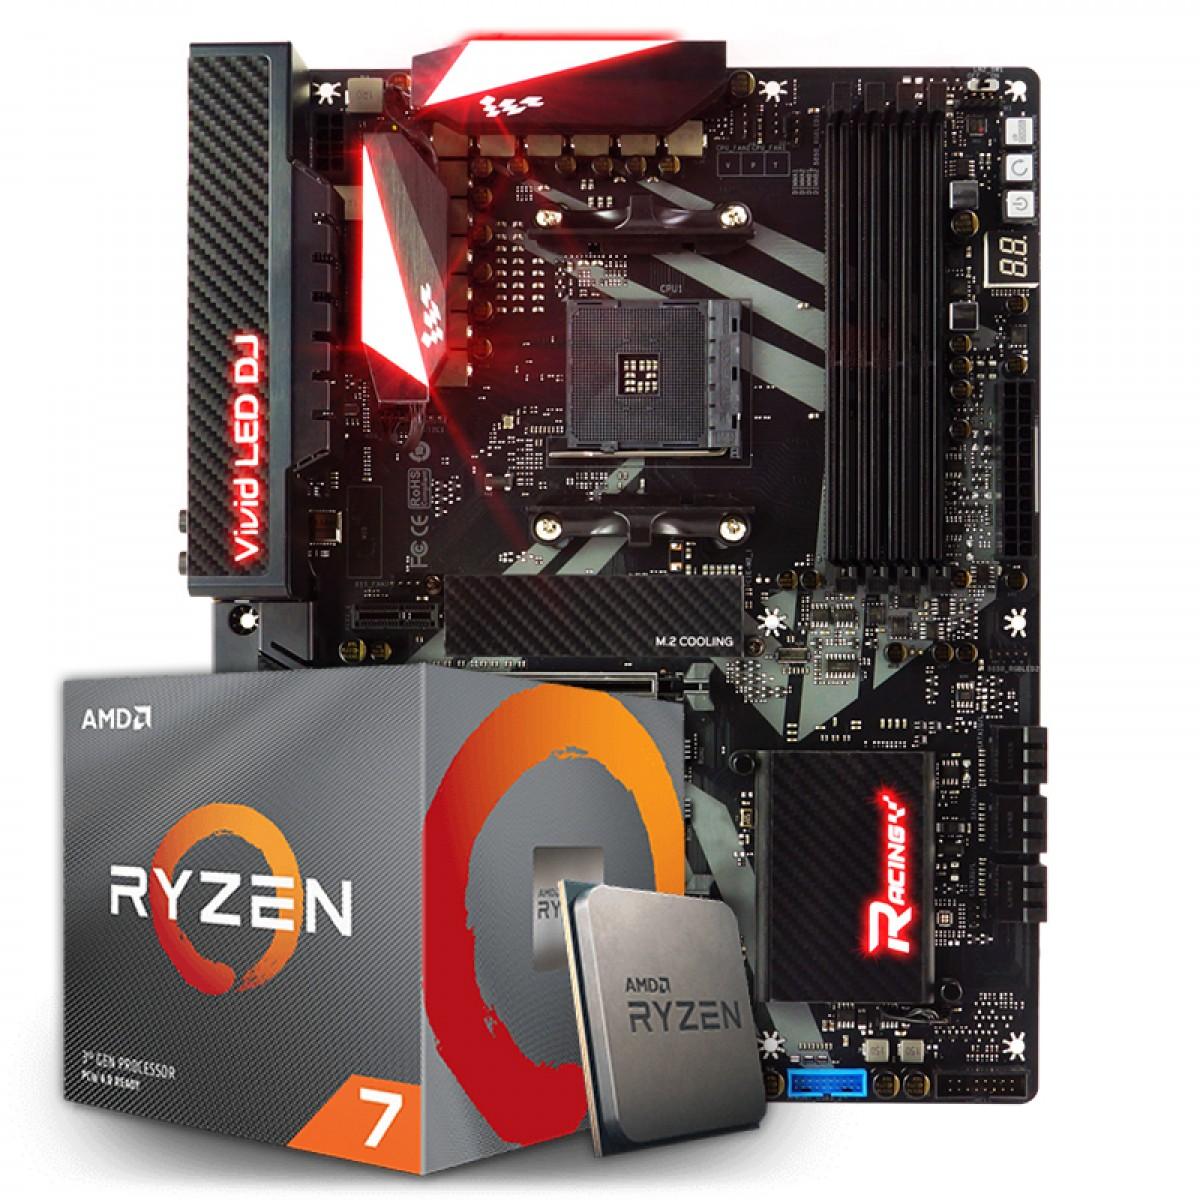 Kit Upgrade Placa Mãe Biostar Racing X470GT8, AMD AM4 + Processador AMD Ryzen 7 3700x 3.6GHz